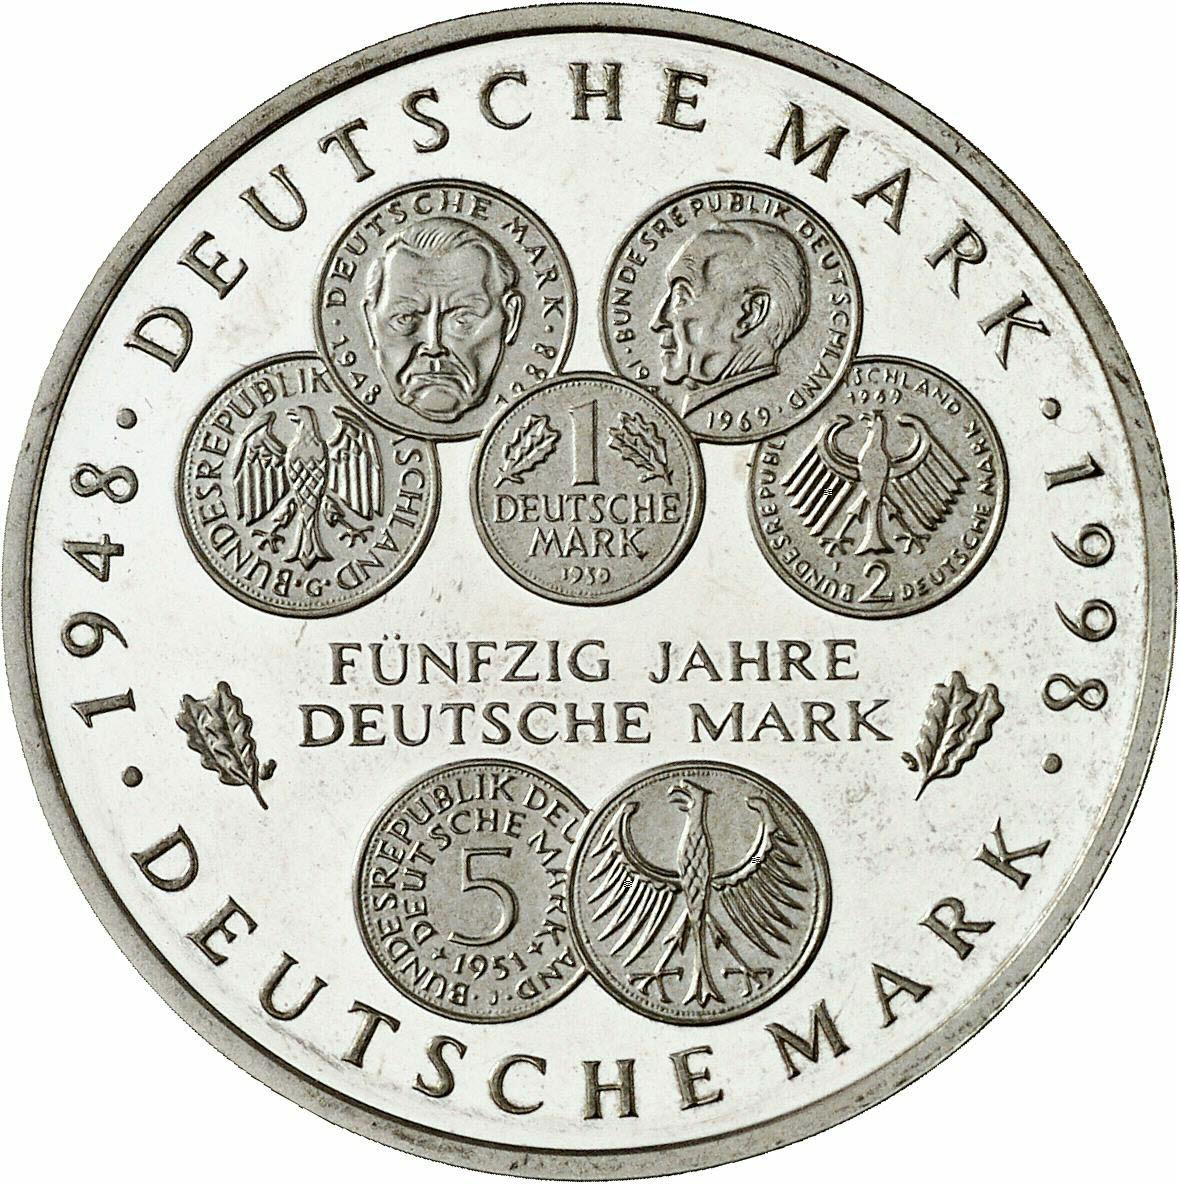 DE 10 Deutsche Mark 1998 A